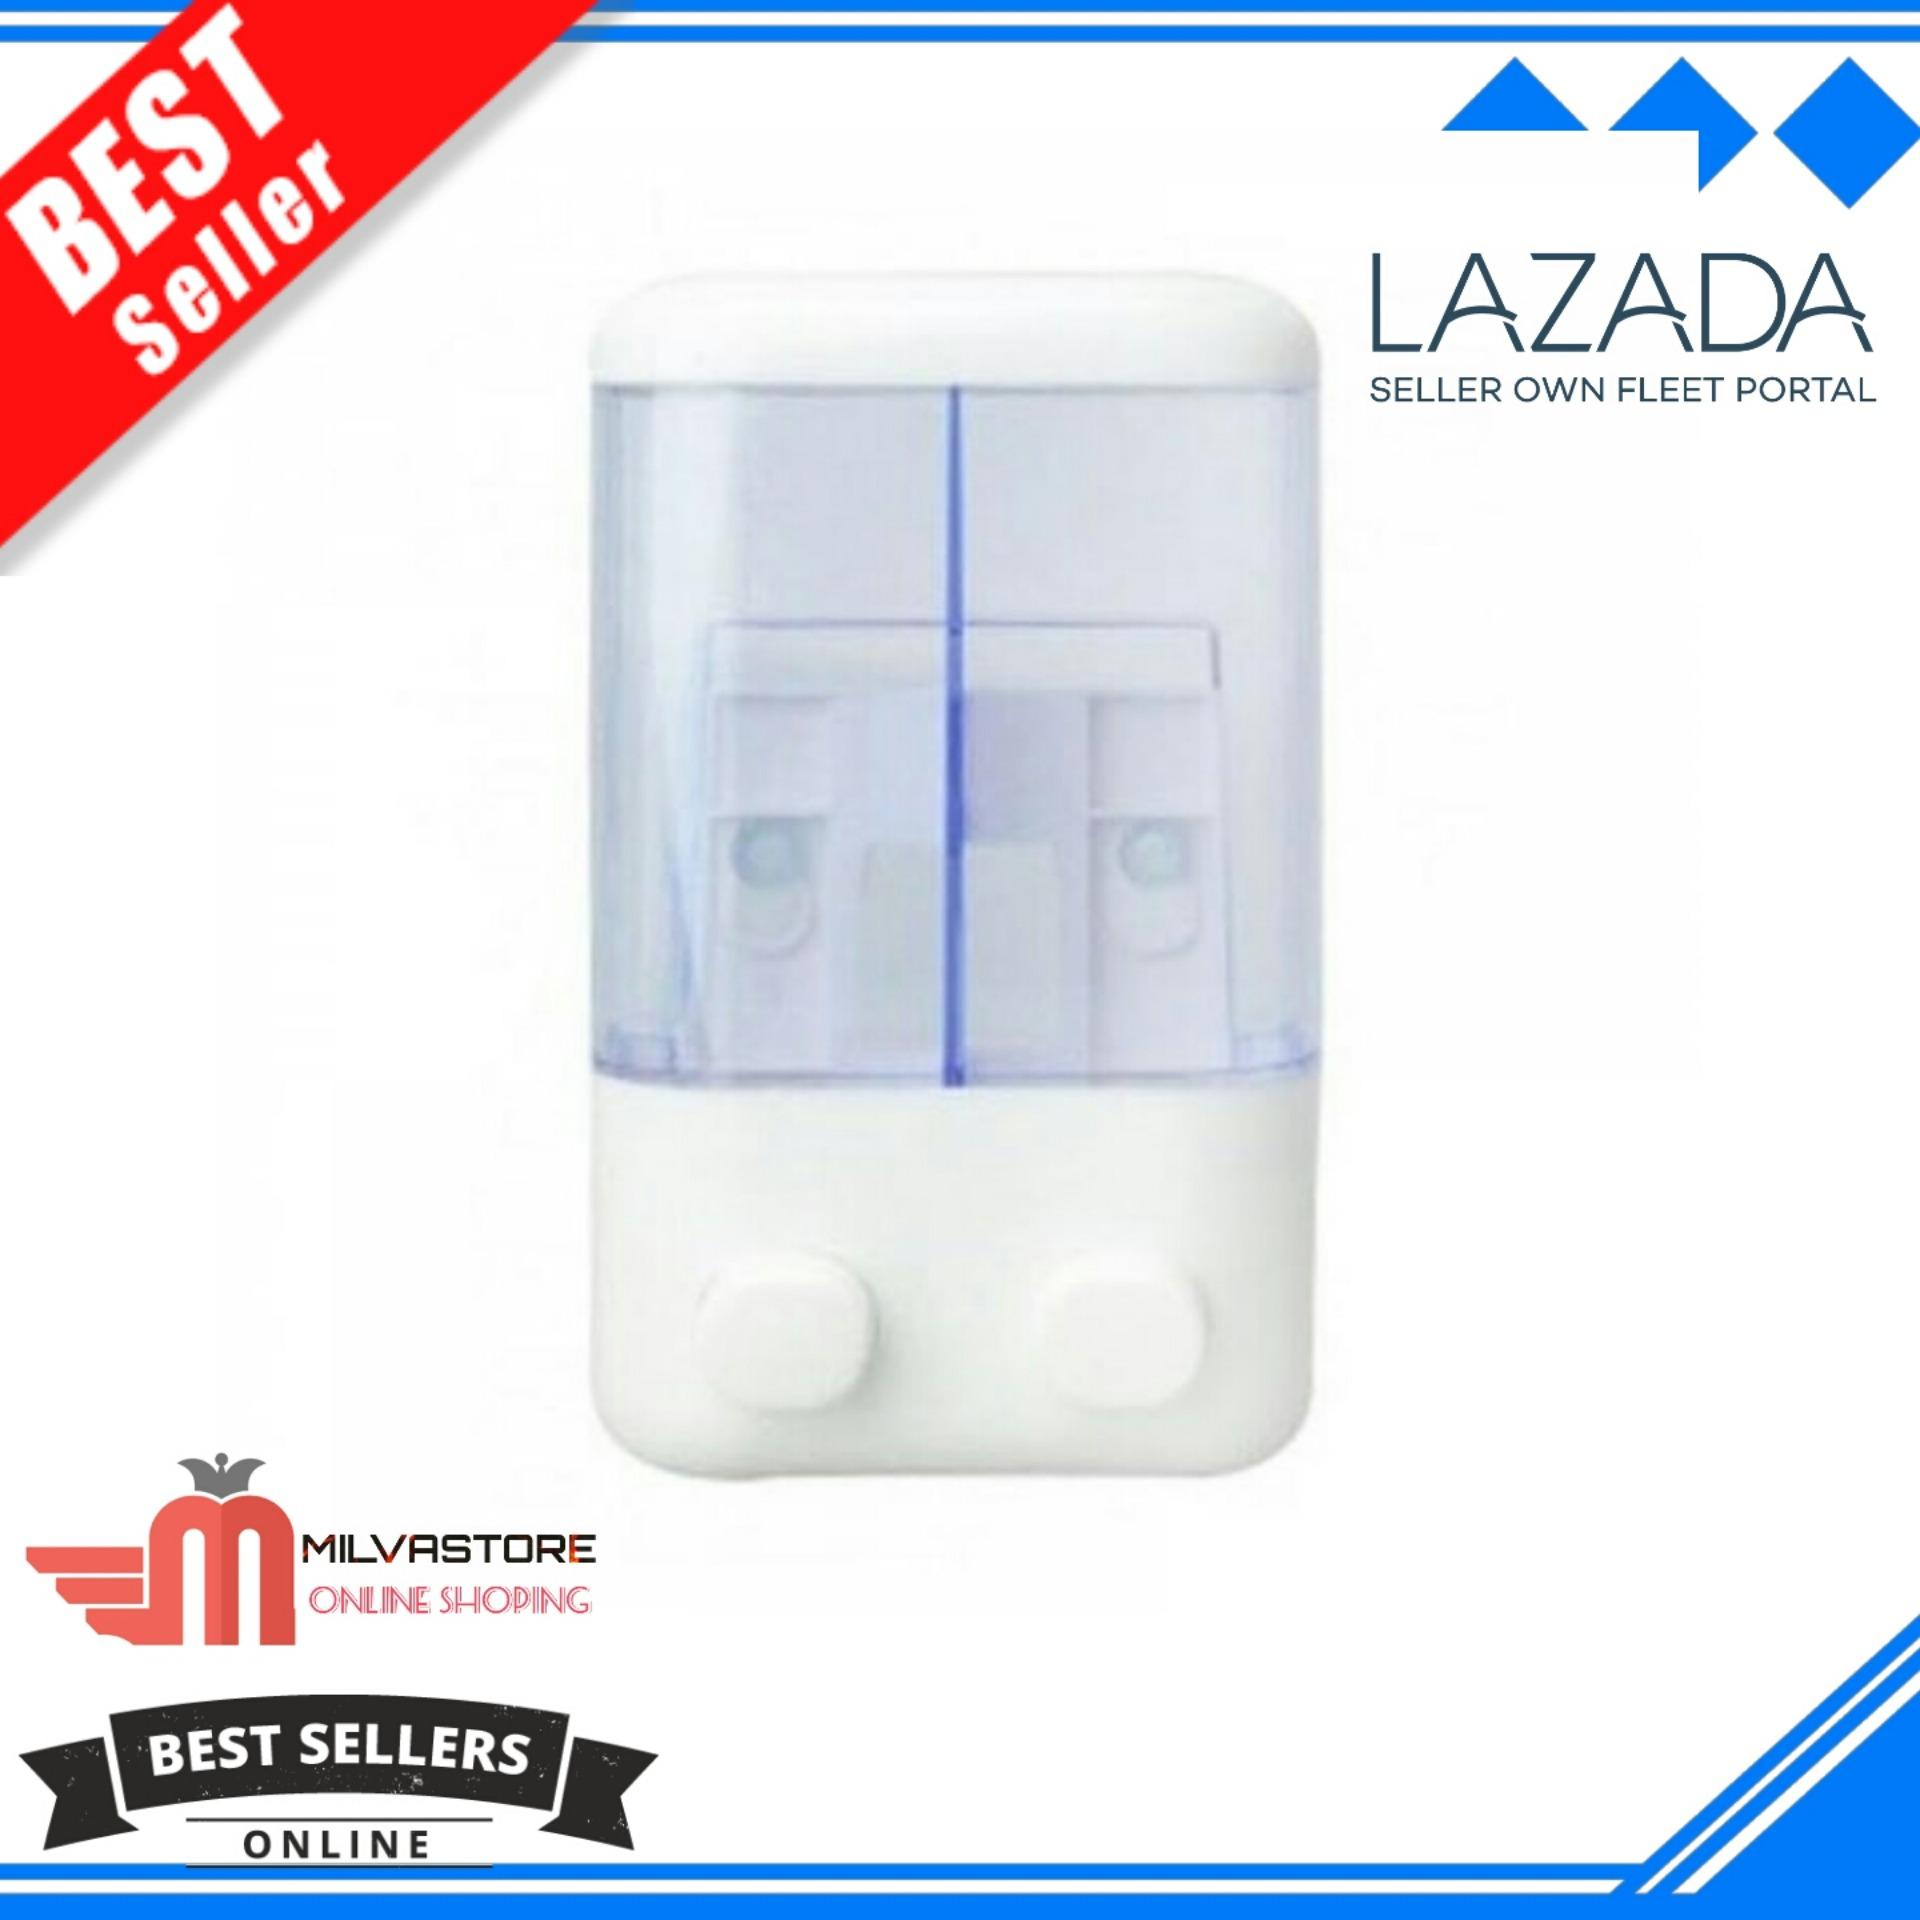 Paket Murah Tempat Sabun Cair Shampoo Pasta Gigi Dan Sikat Gigi